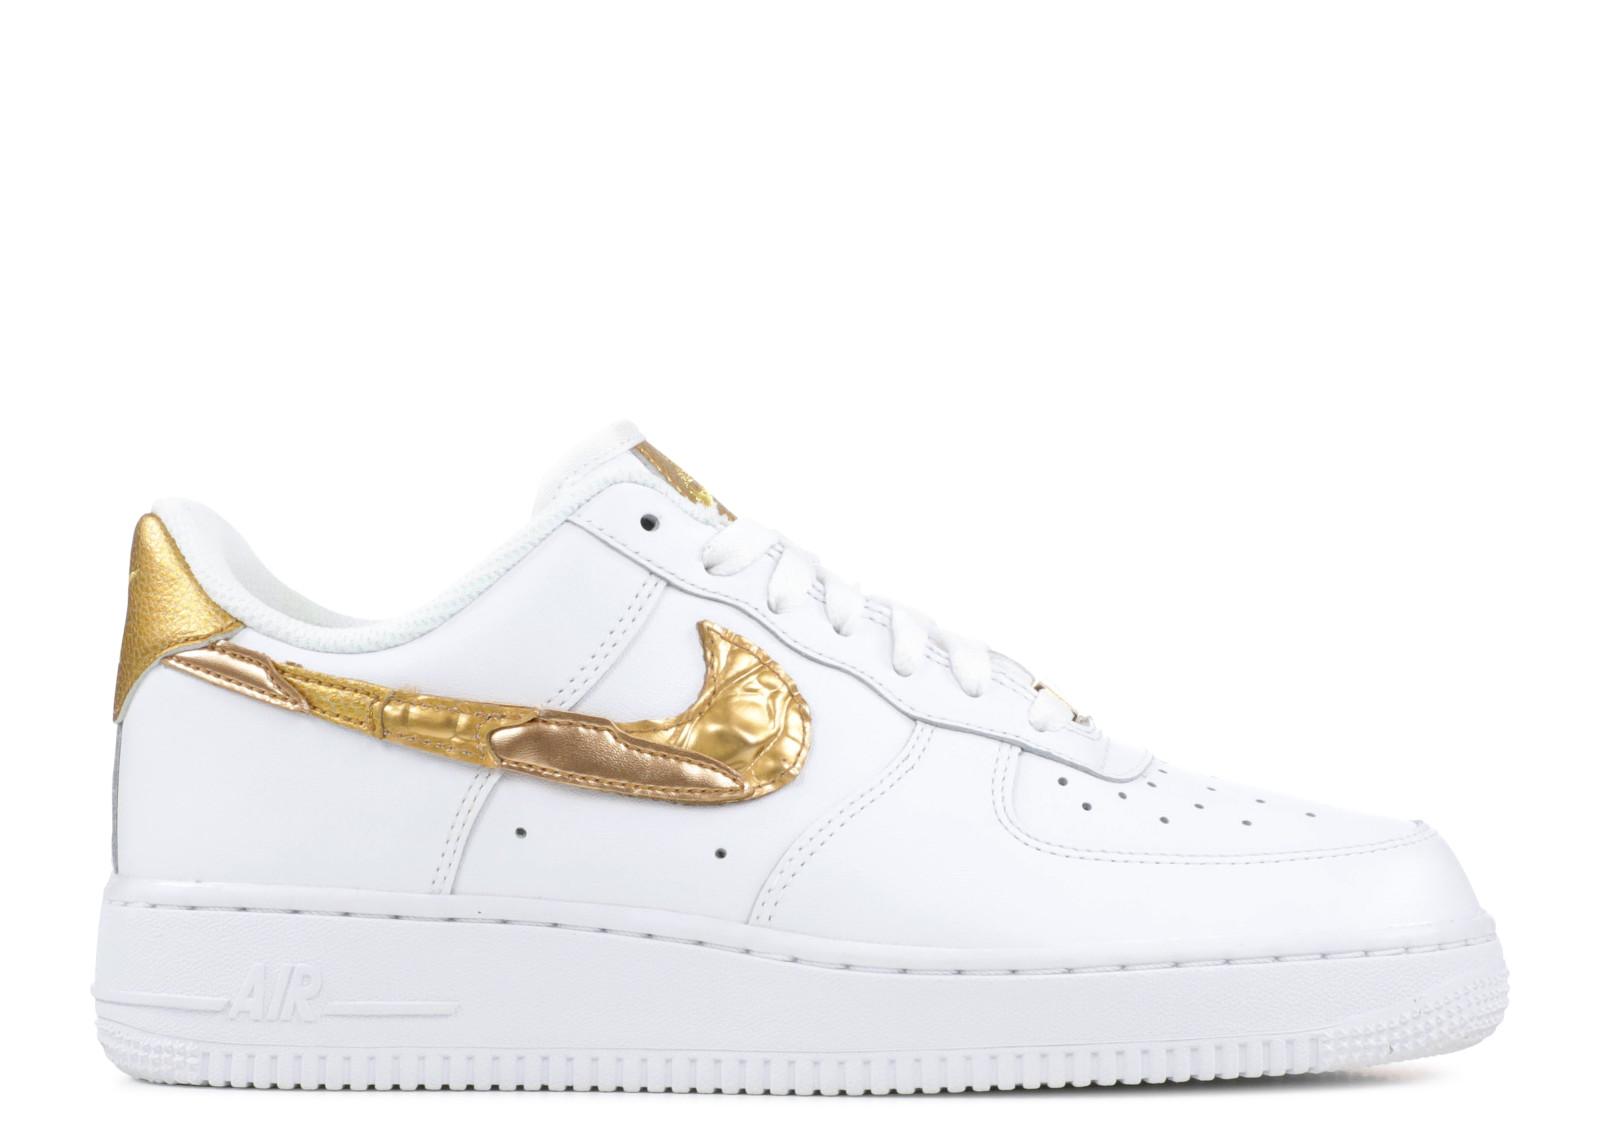 Nike Air Force 1 CR7 Golden Patchwork | AQ0666 100